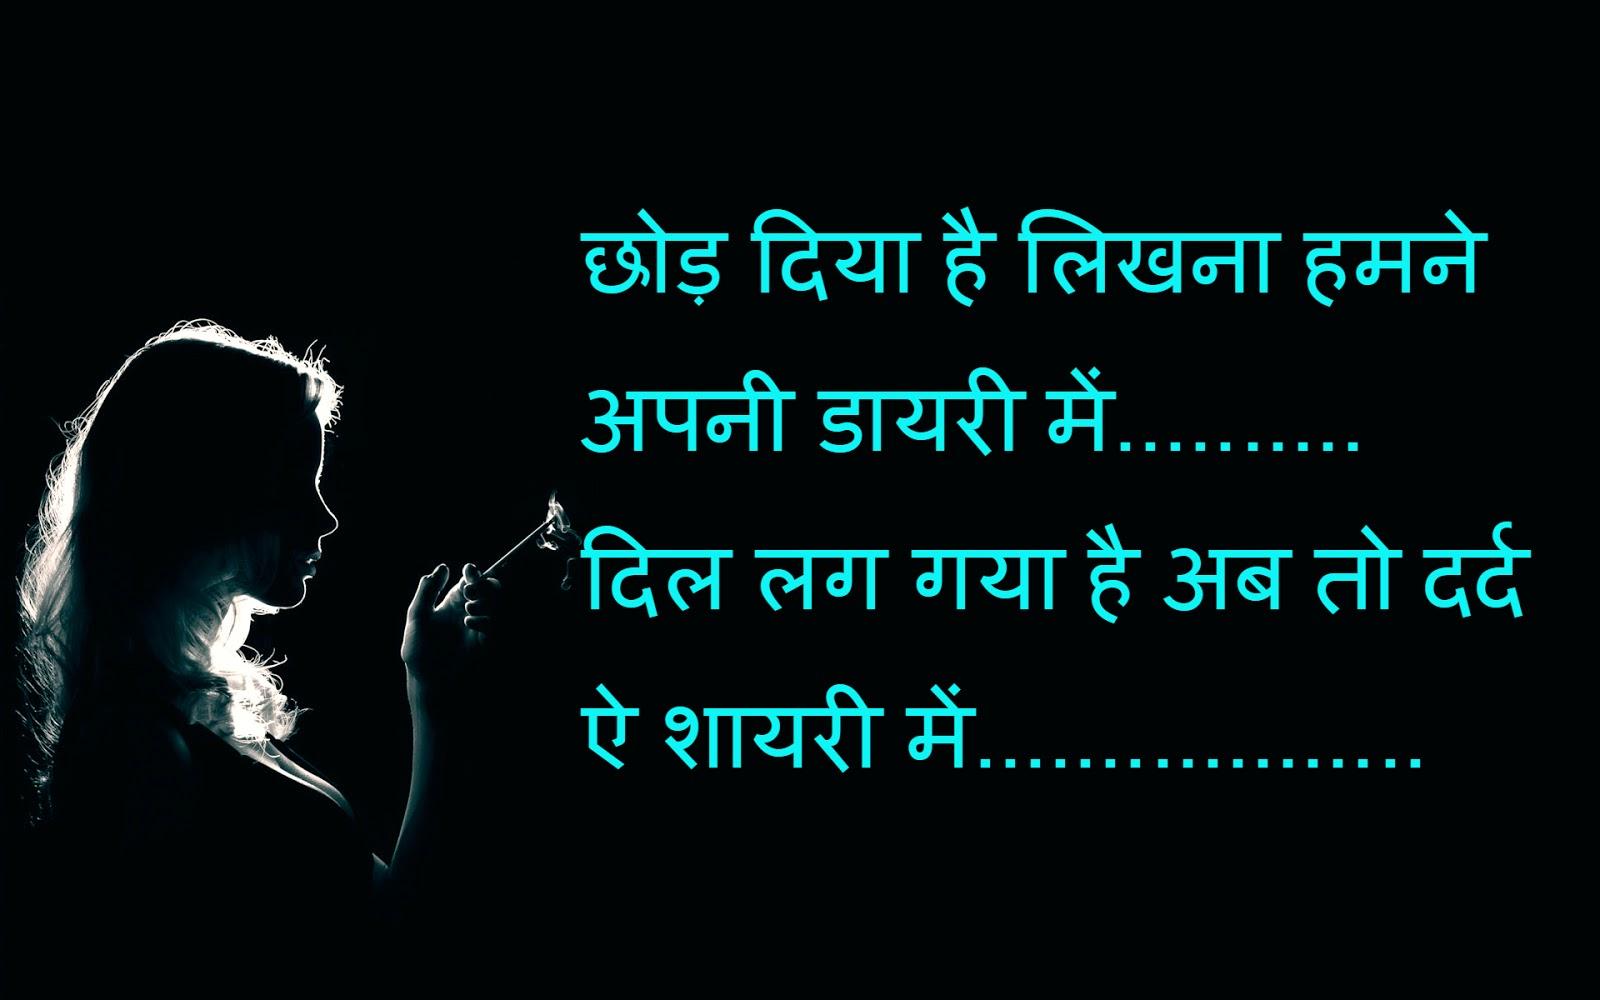 Wallpaper download attitude - Attitude Shayari In Hindi Wallpaper